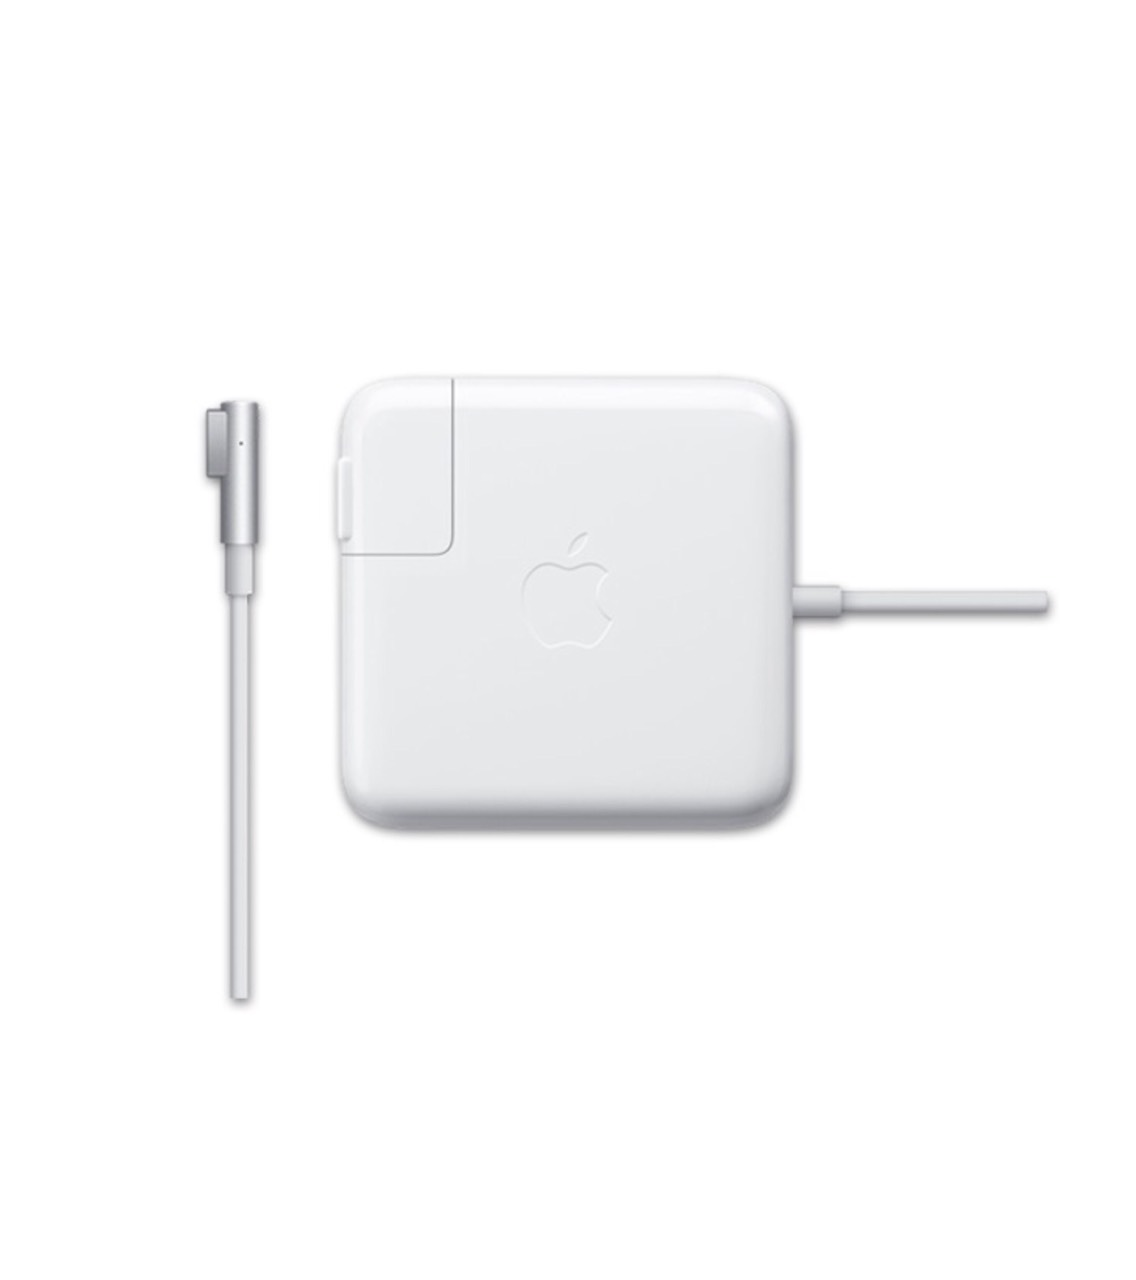 Apple 85W magsafe 2 Power Adapter (Chính hãng)